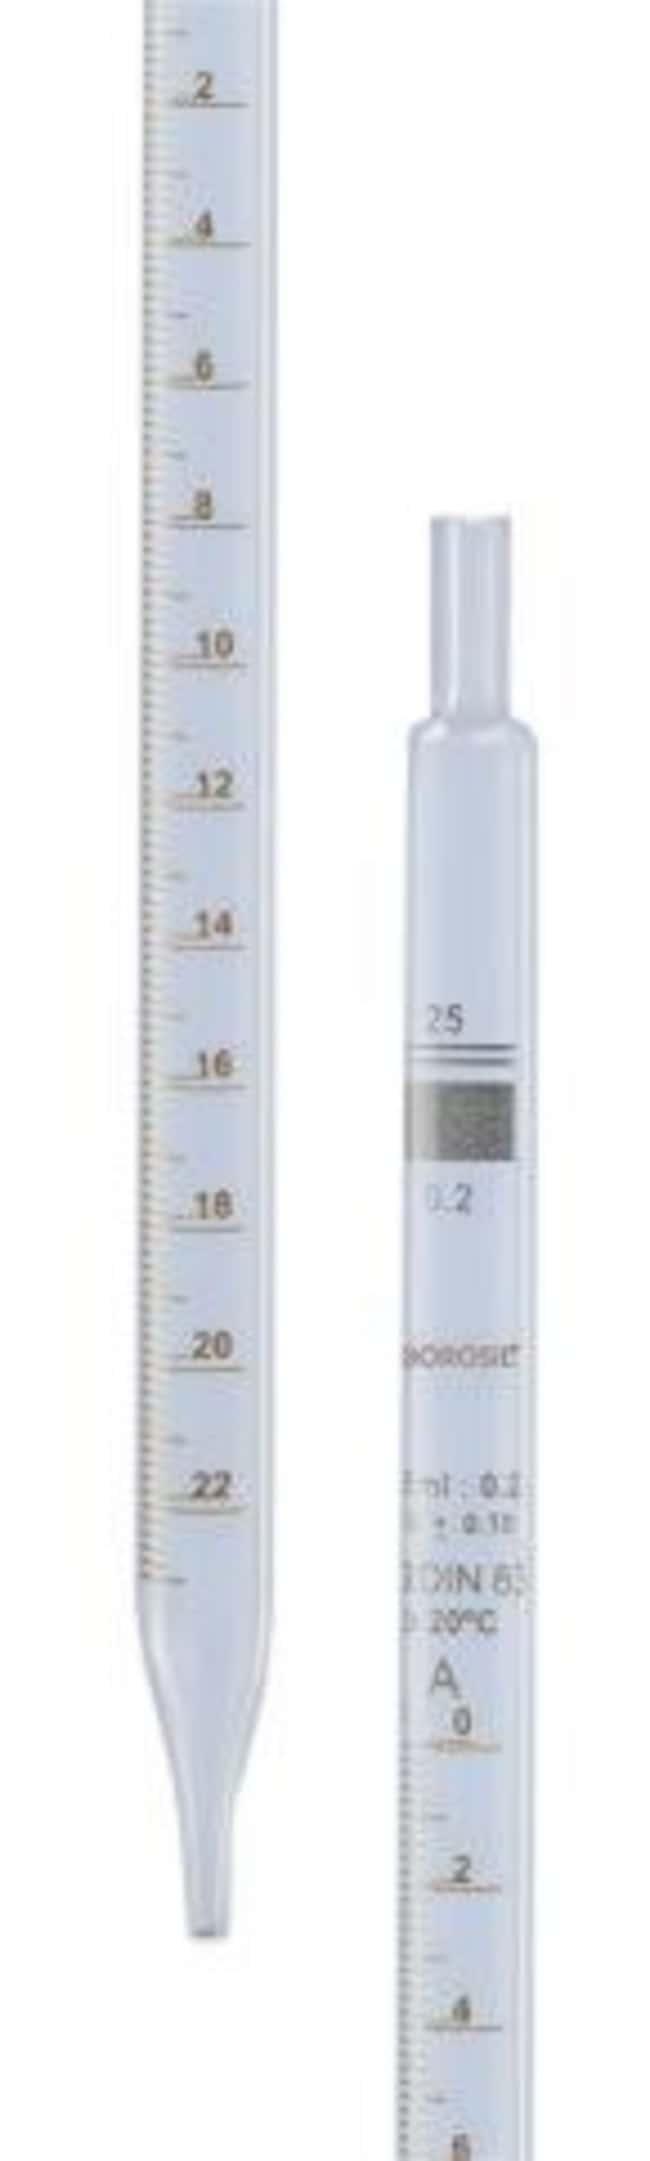 Foxx Life Sciences Borosil(T) Reusable Class B Mohr (Measuring) Pipettes